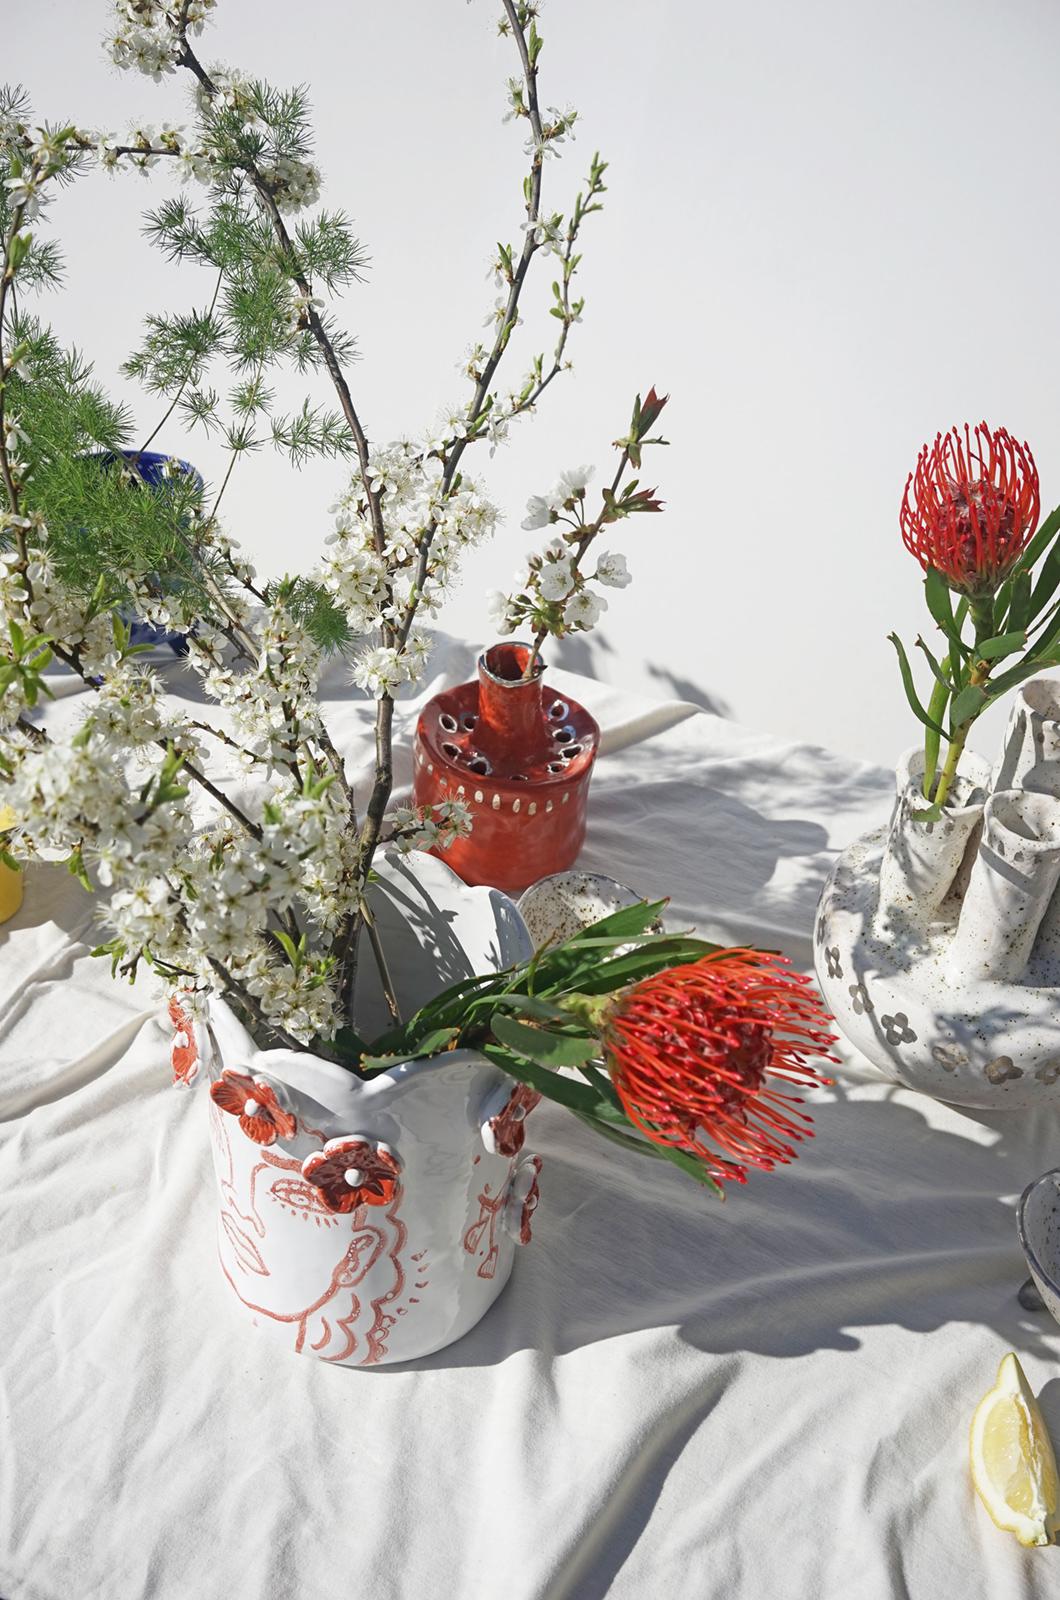 alagonda-grote-vaas-met-bloemen3